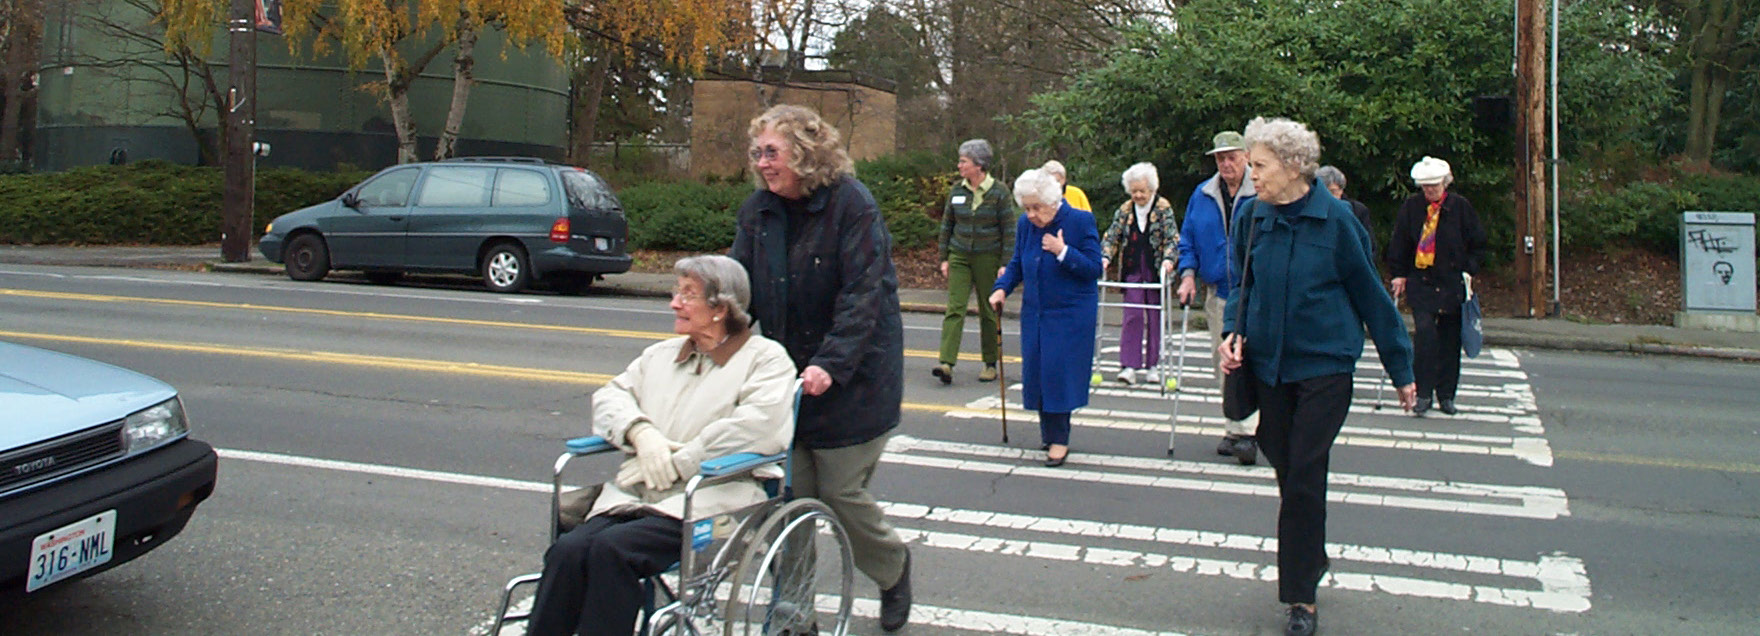 group of seniors crossing the street